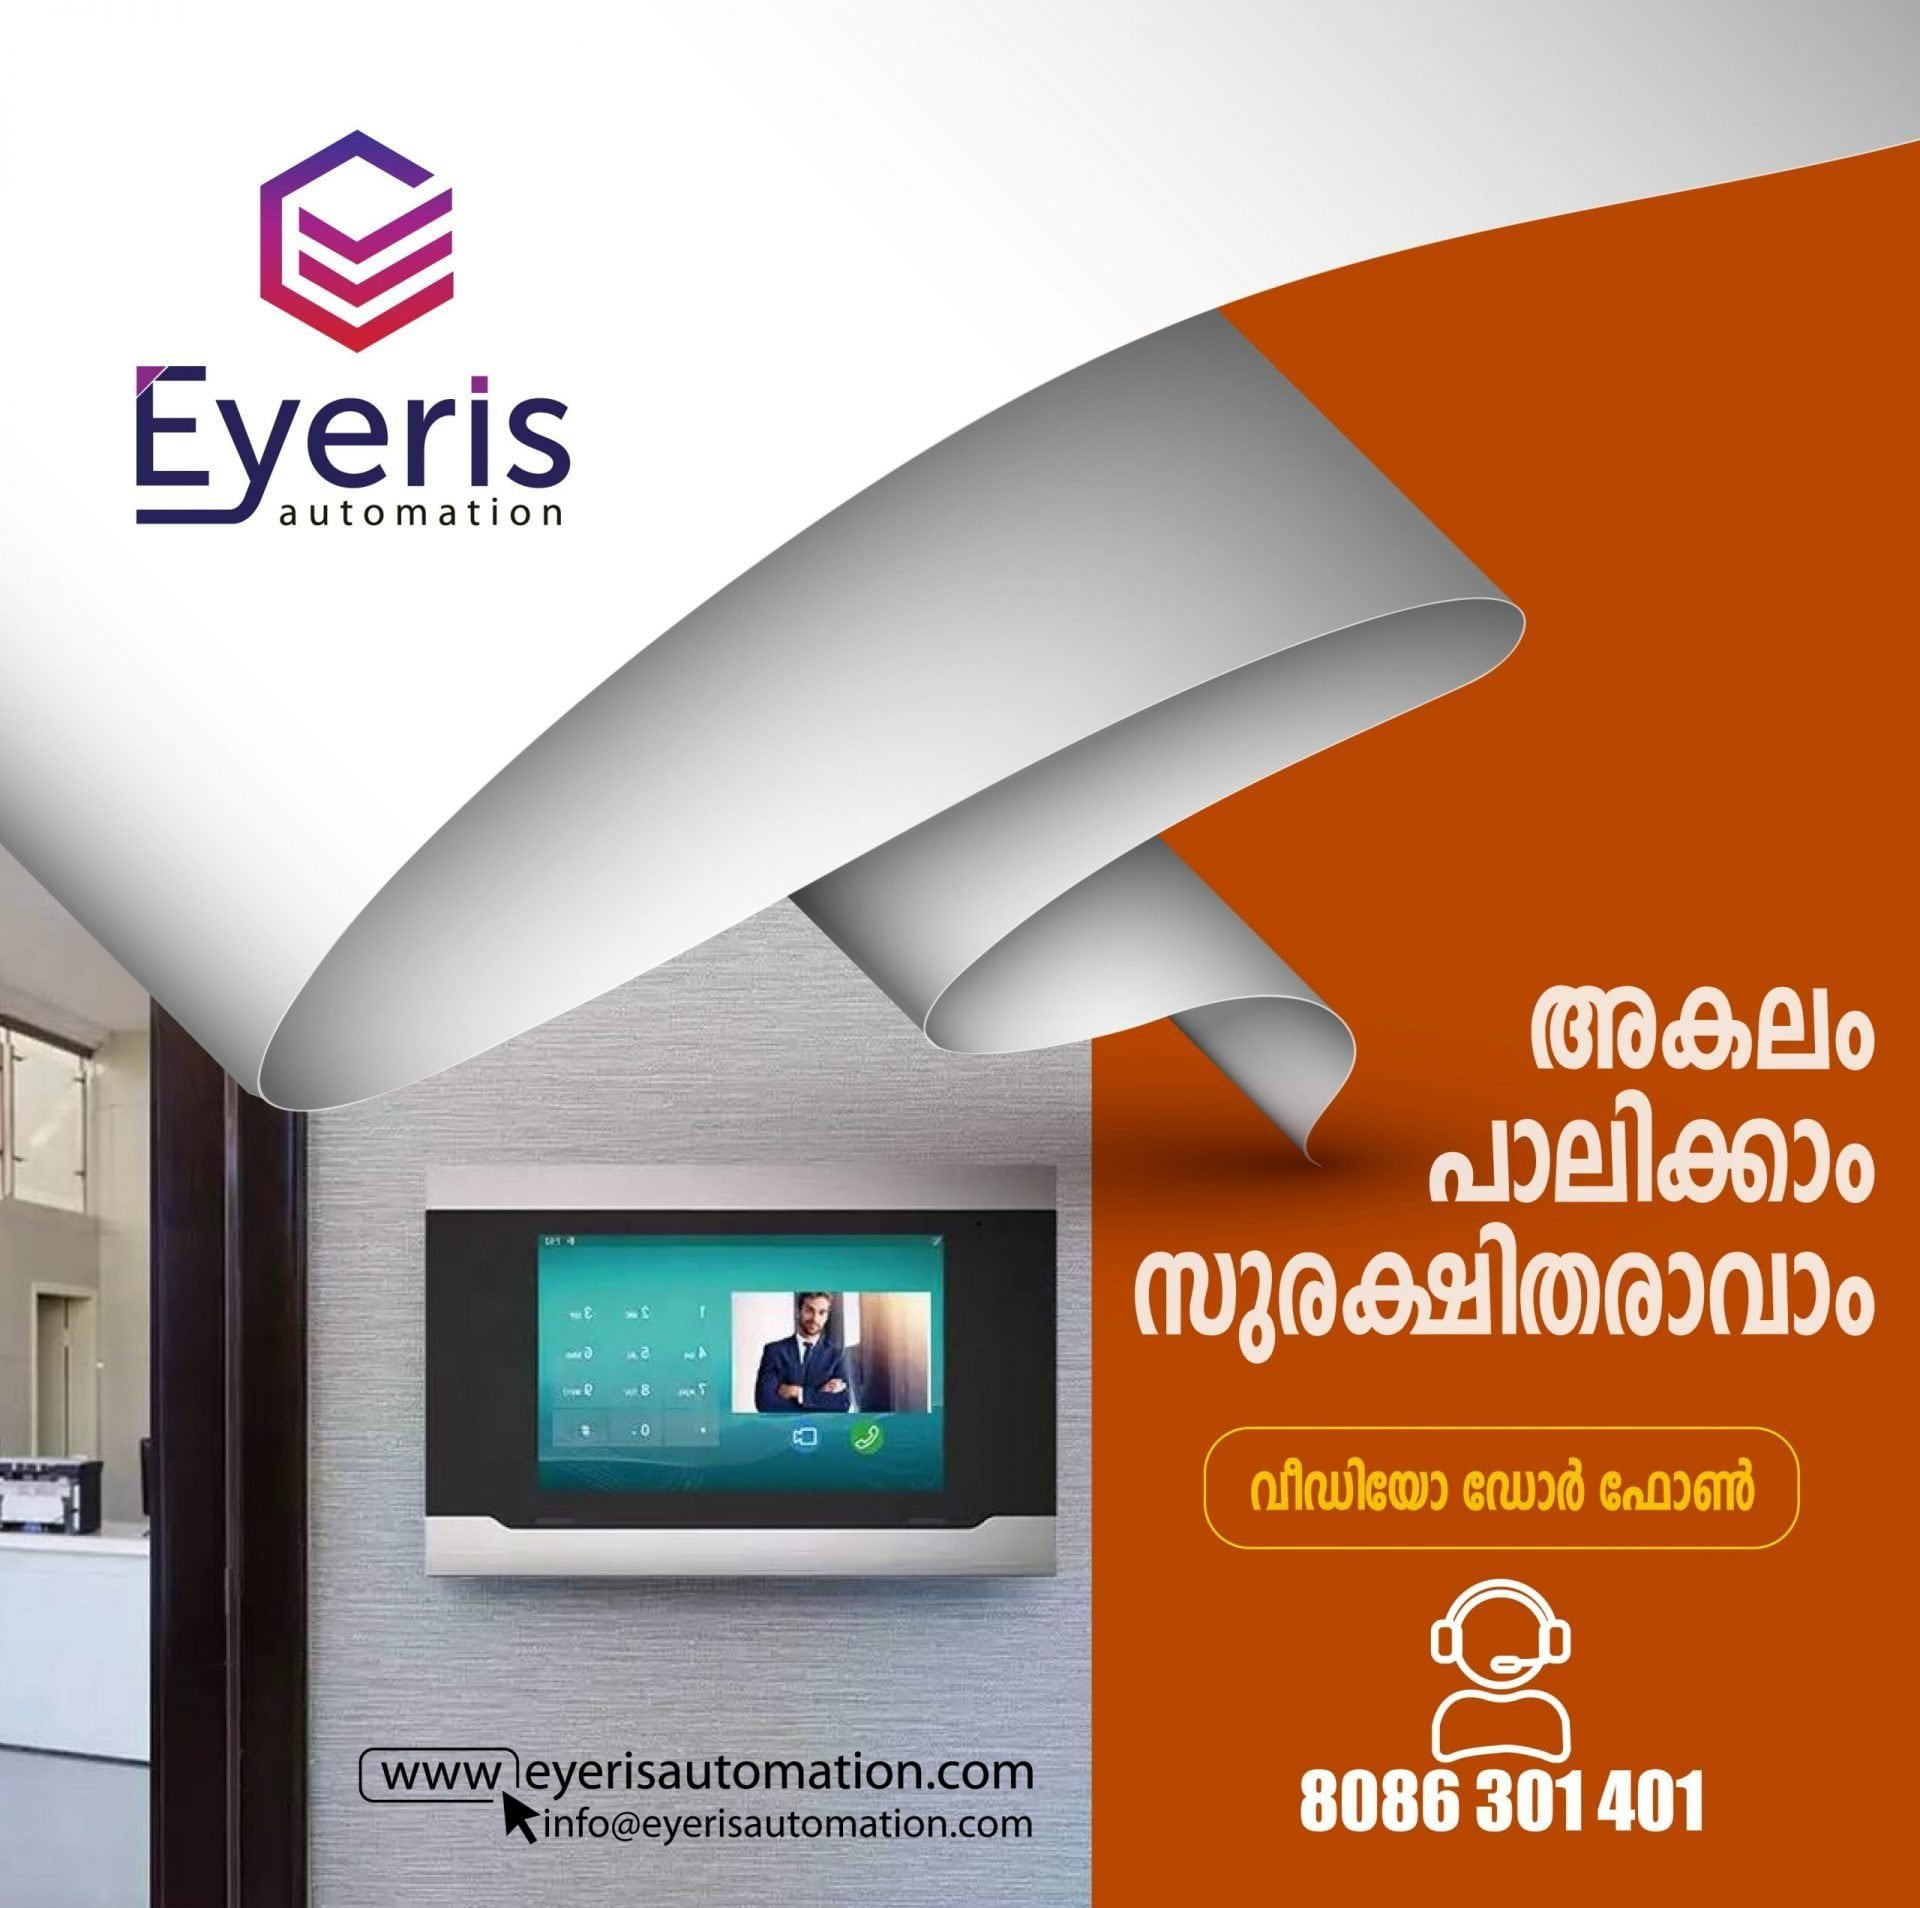 Eyeris Automation